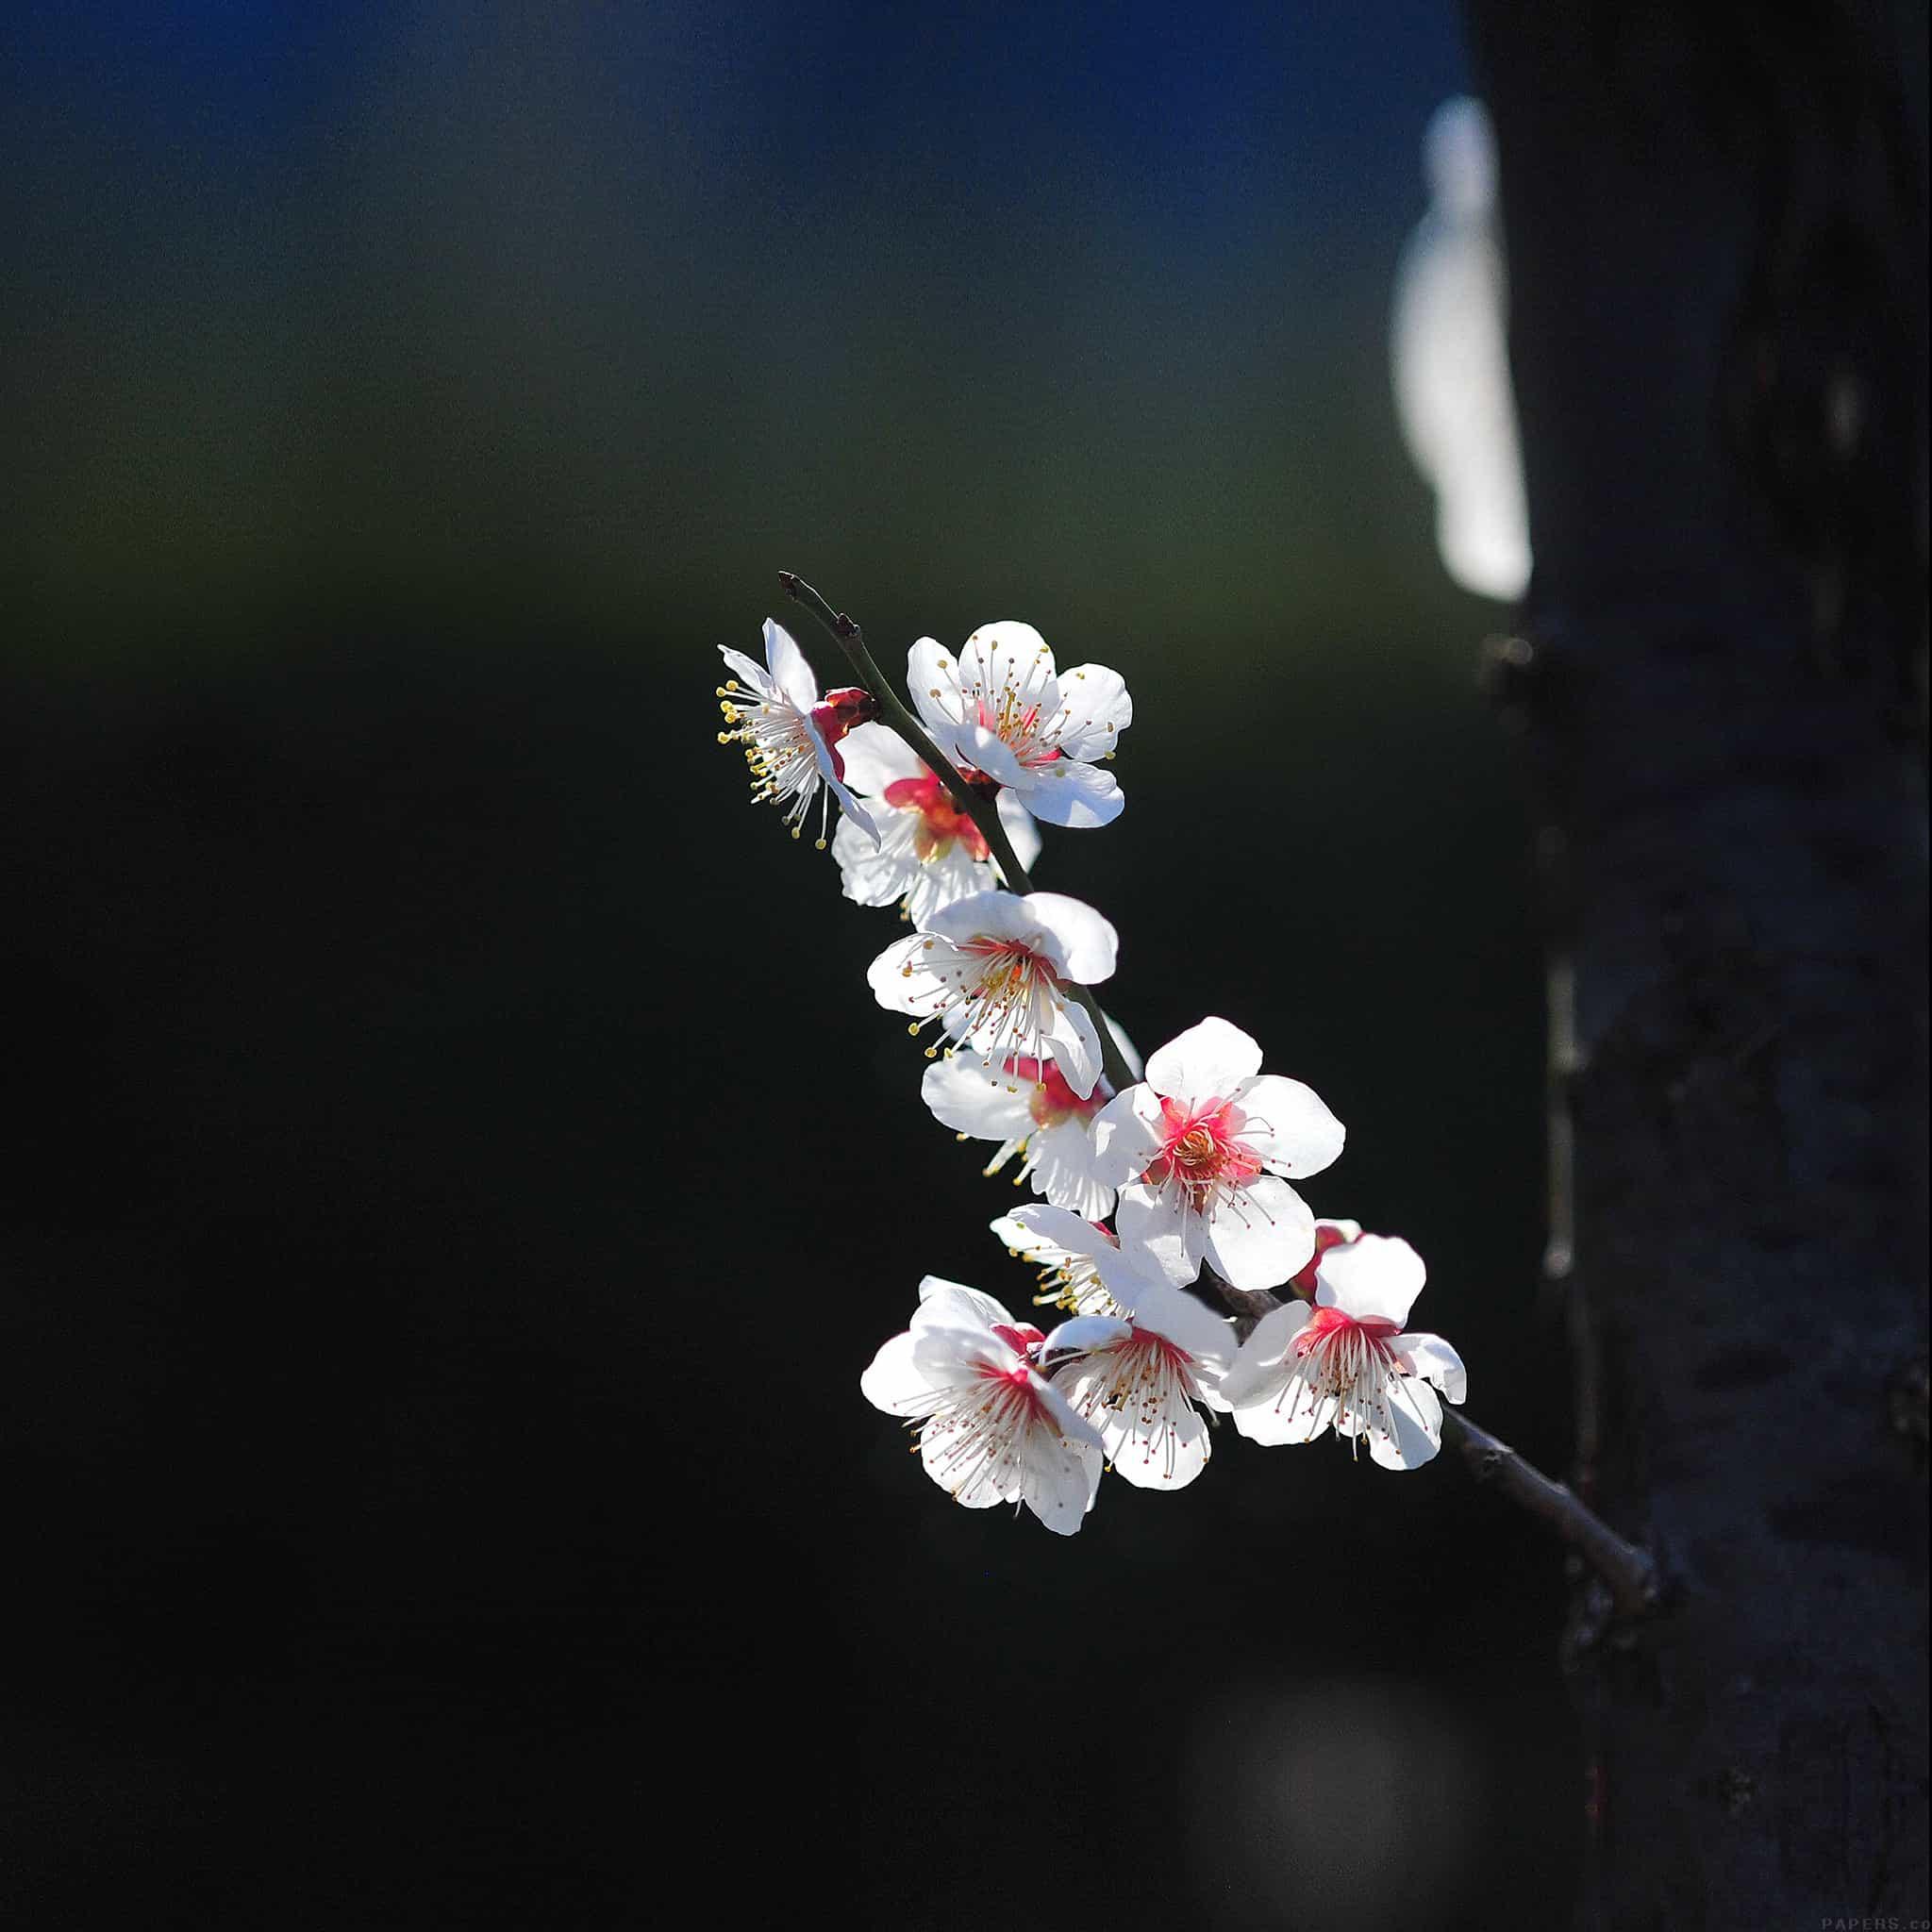 Papers.co-mq22-spring-flower-sakura-nature-tree-android-medium